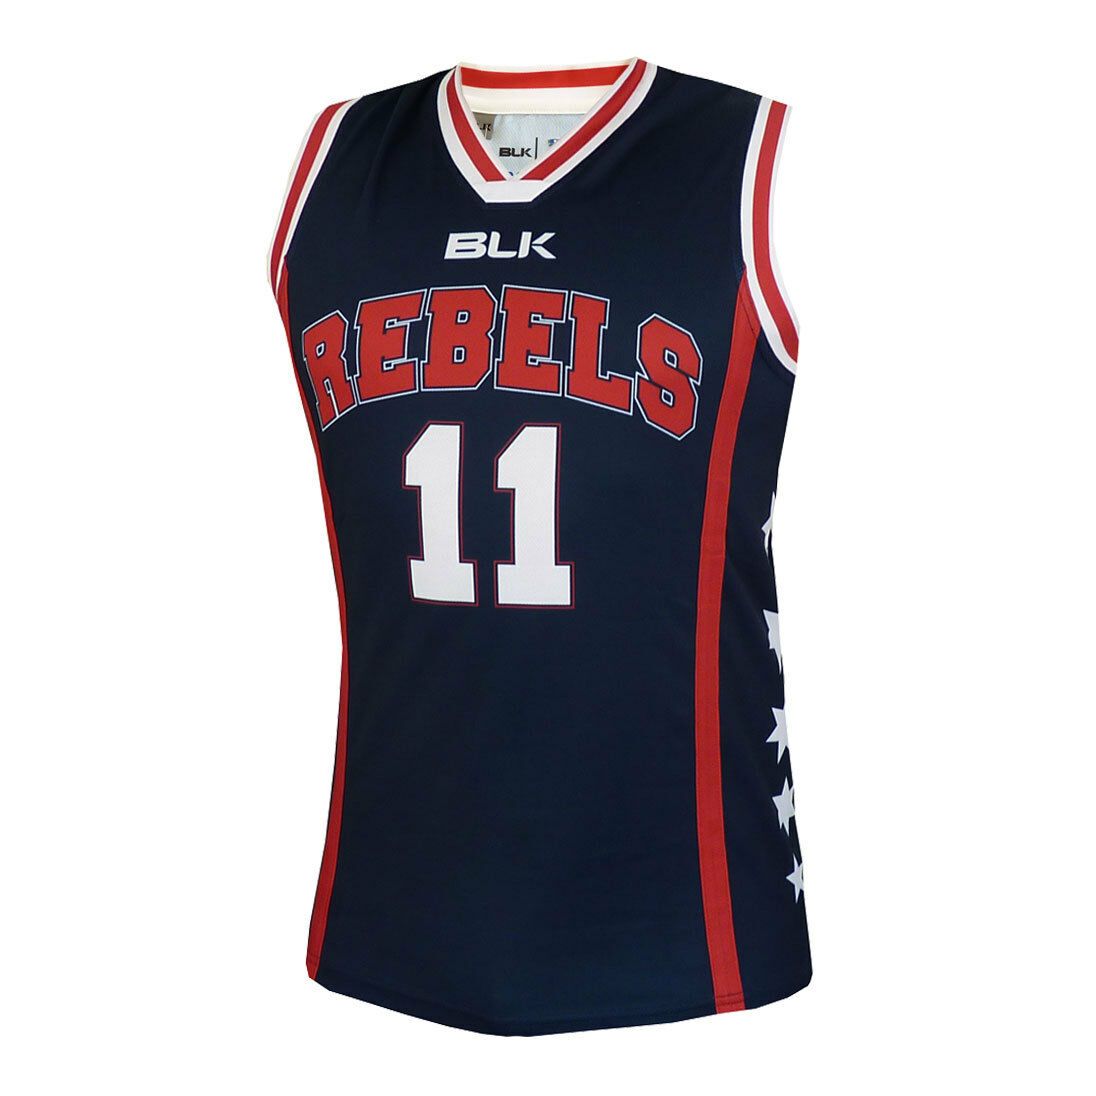 Melbourne Rebels Basketball Singlet  - Sizes XS - 5XL  SALE PRICE